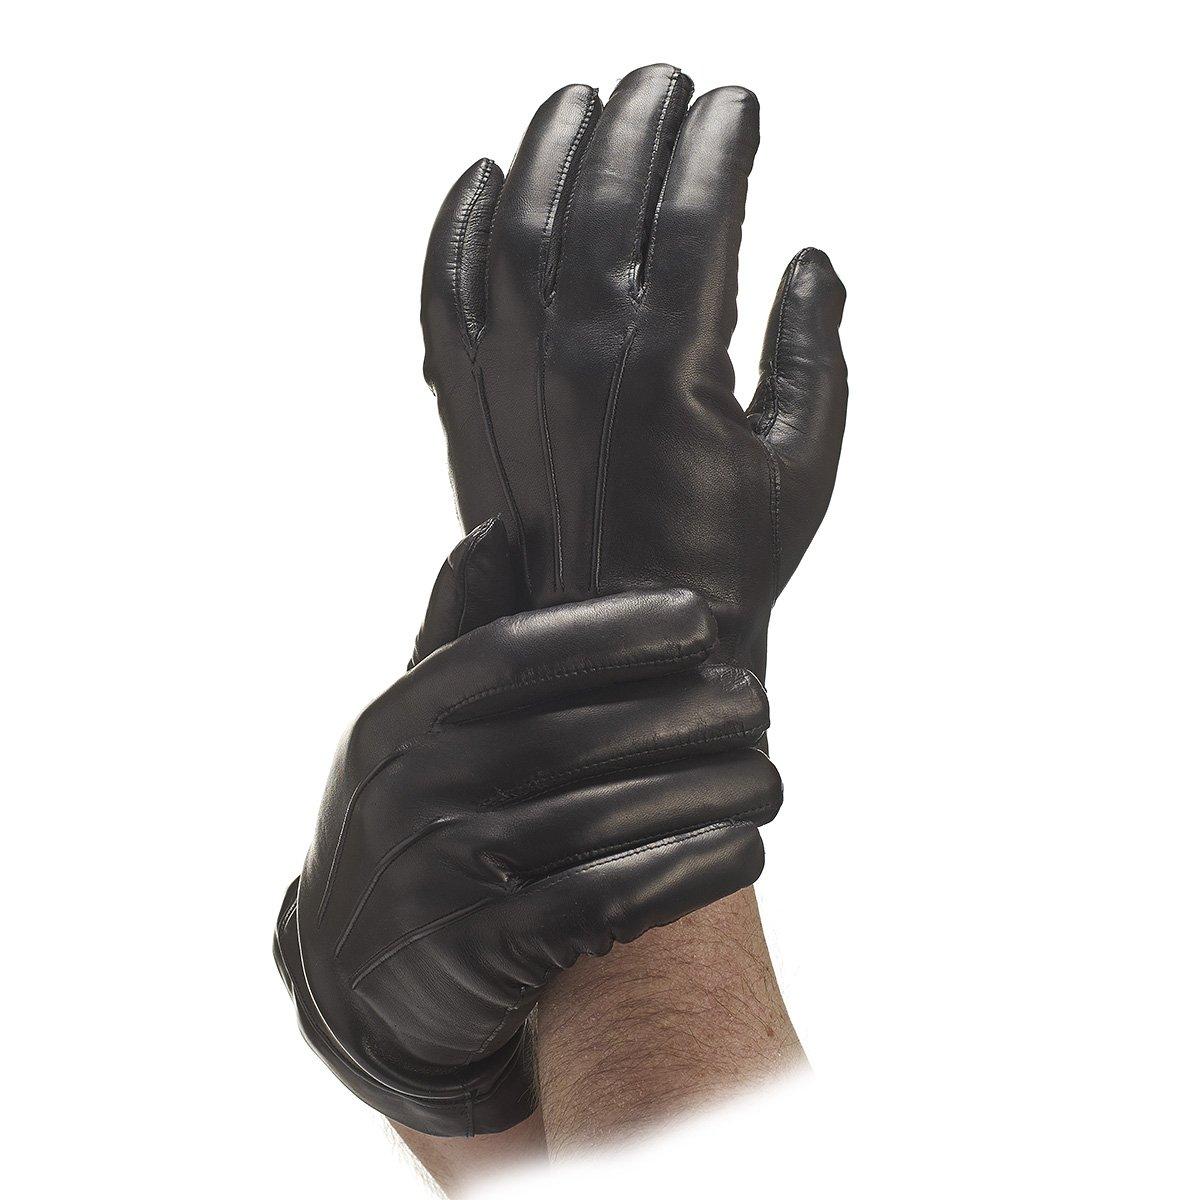 Men's Italian Cashmere Lined Kidskin Gloves (Small, Black)